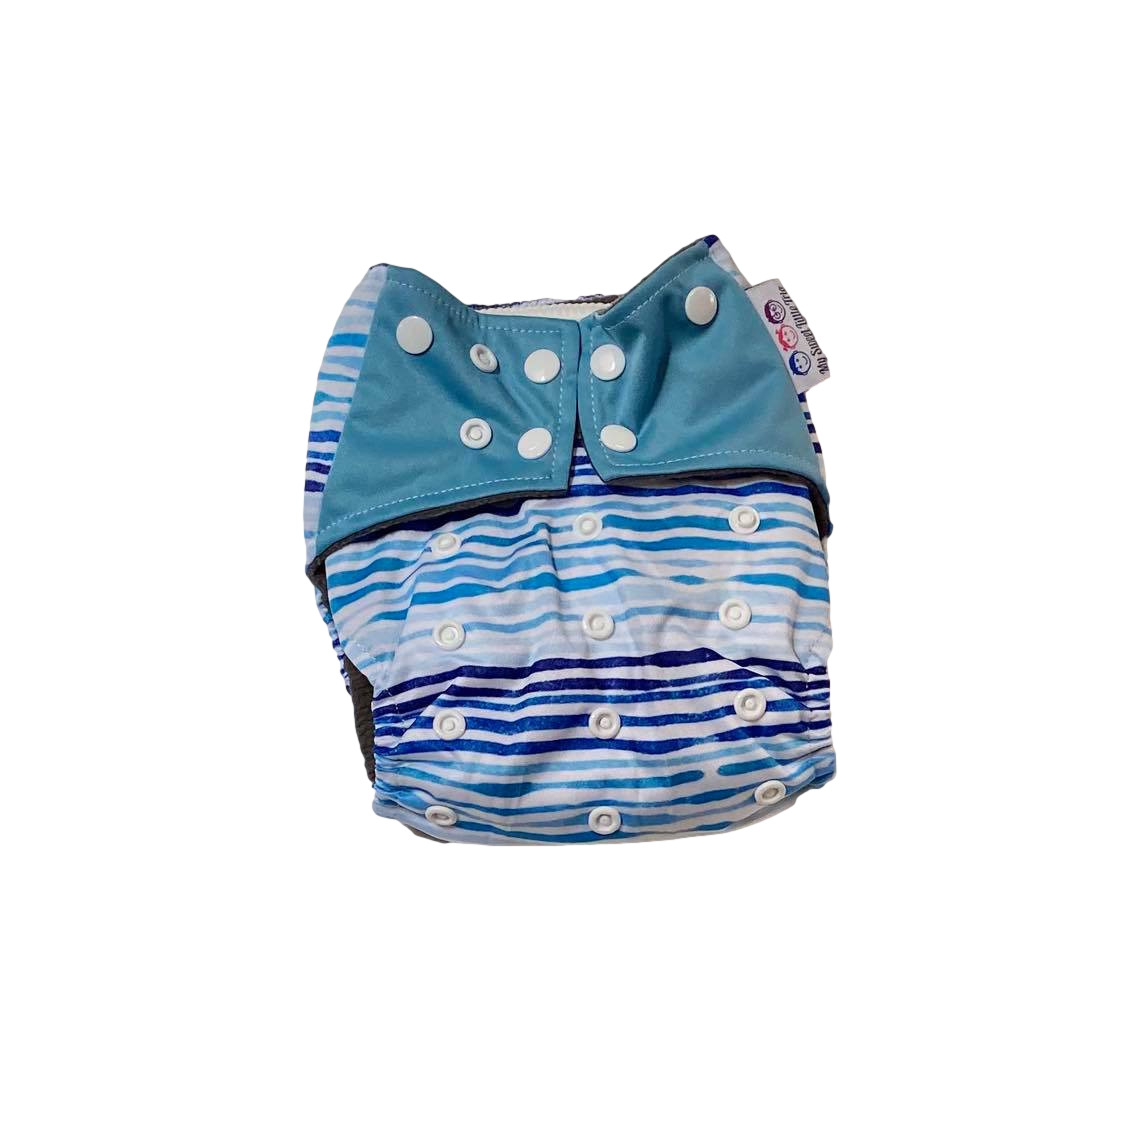 cloth nappies - Blue Waves | Trada Marketplace